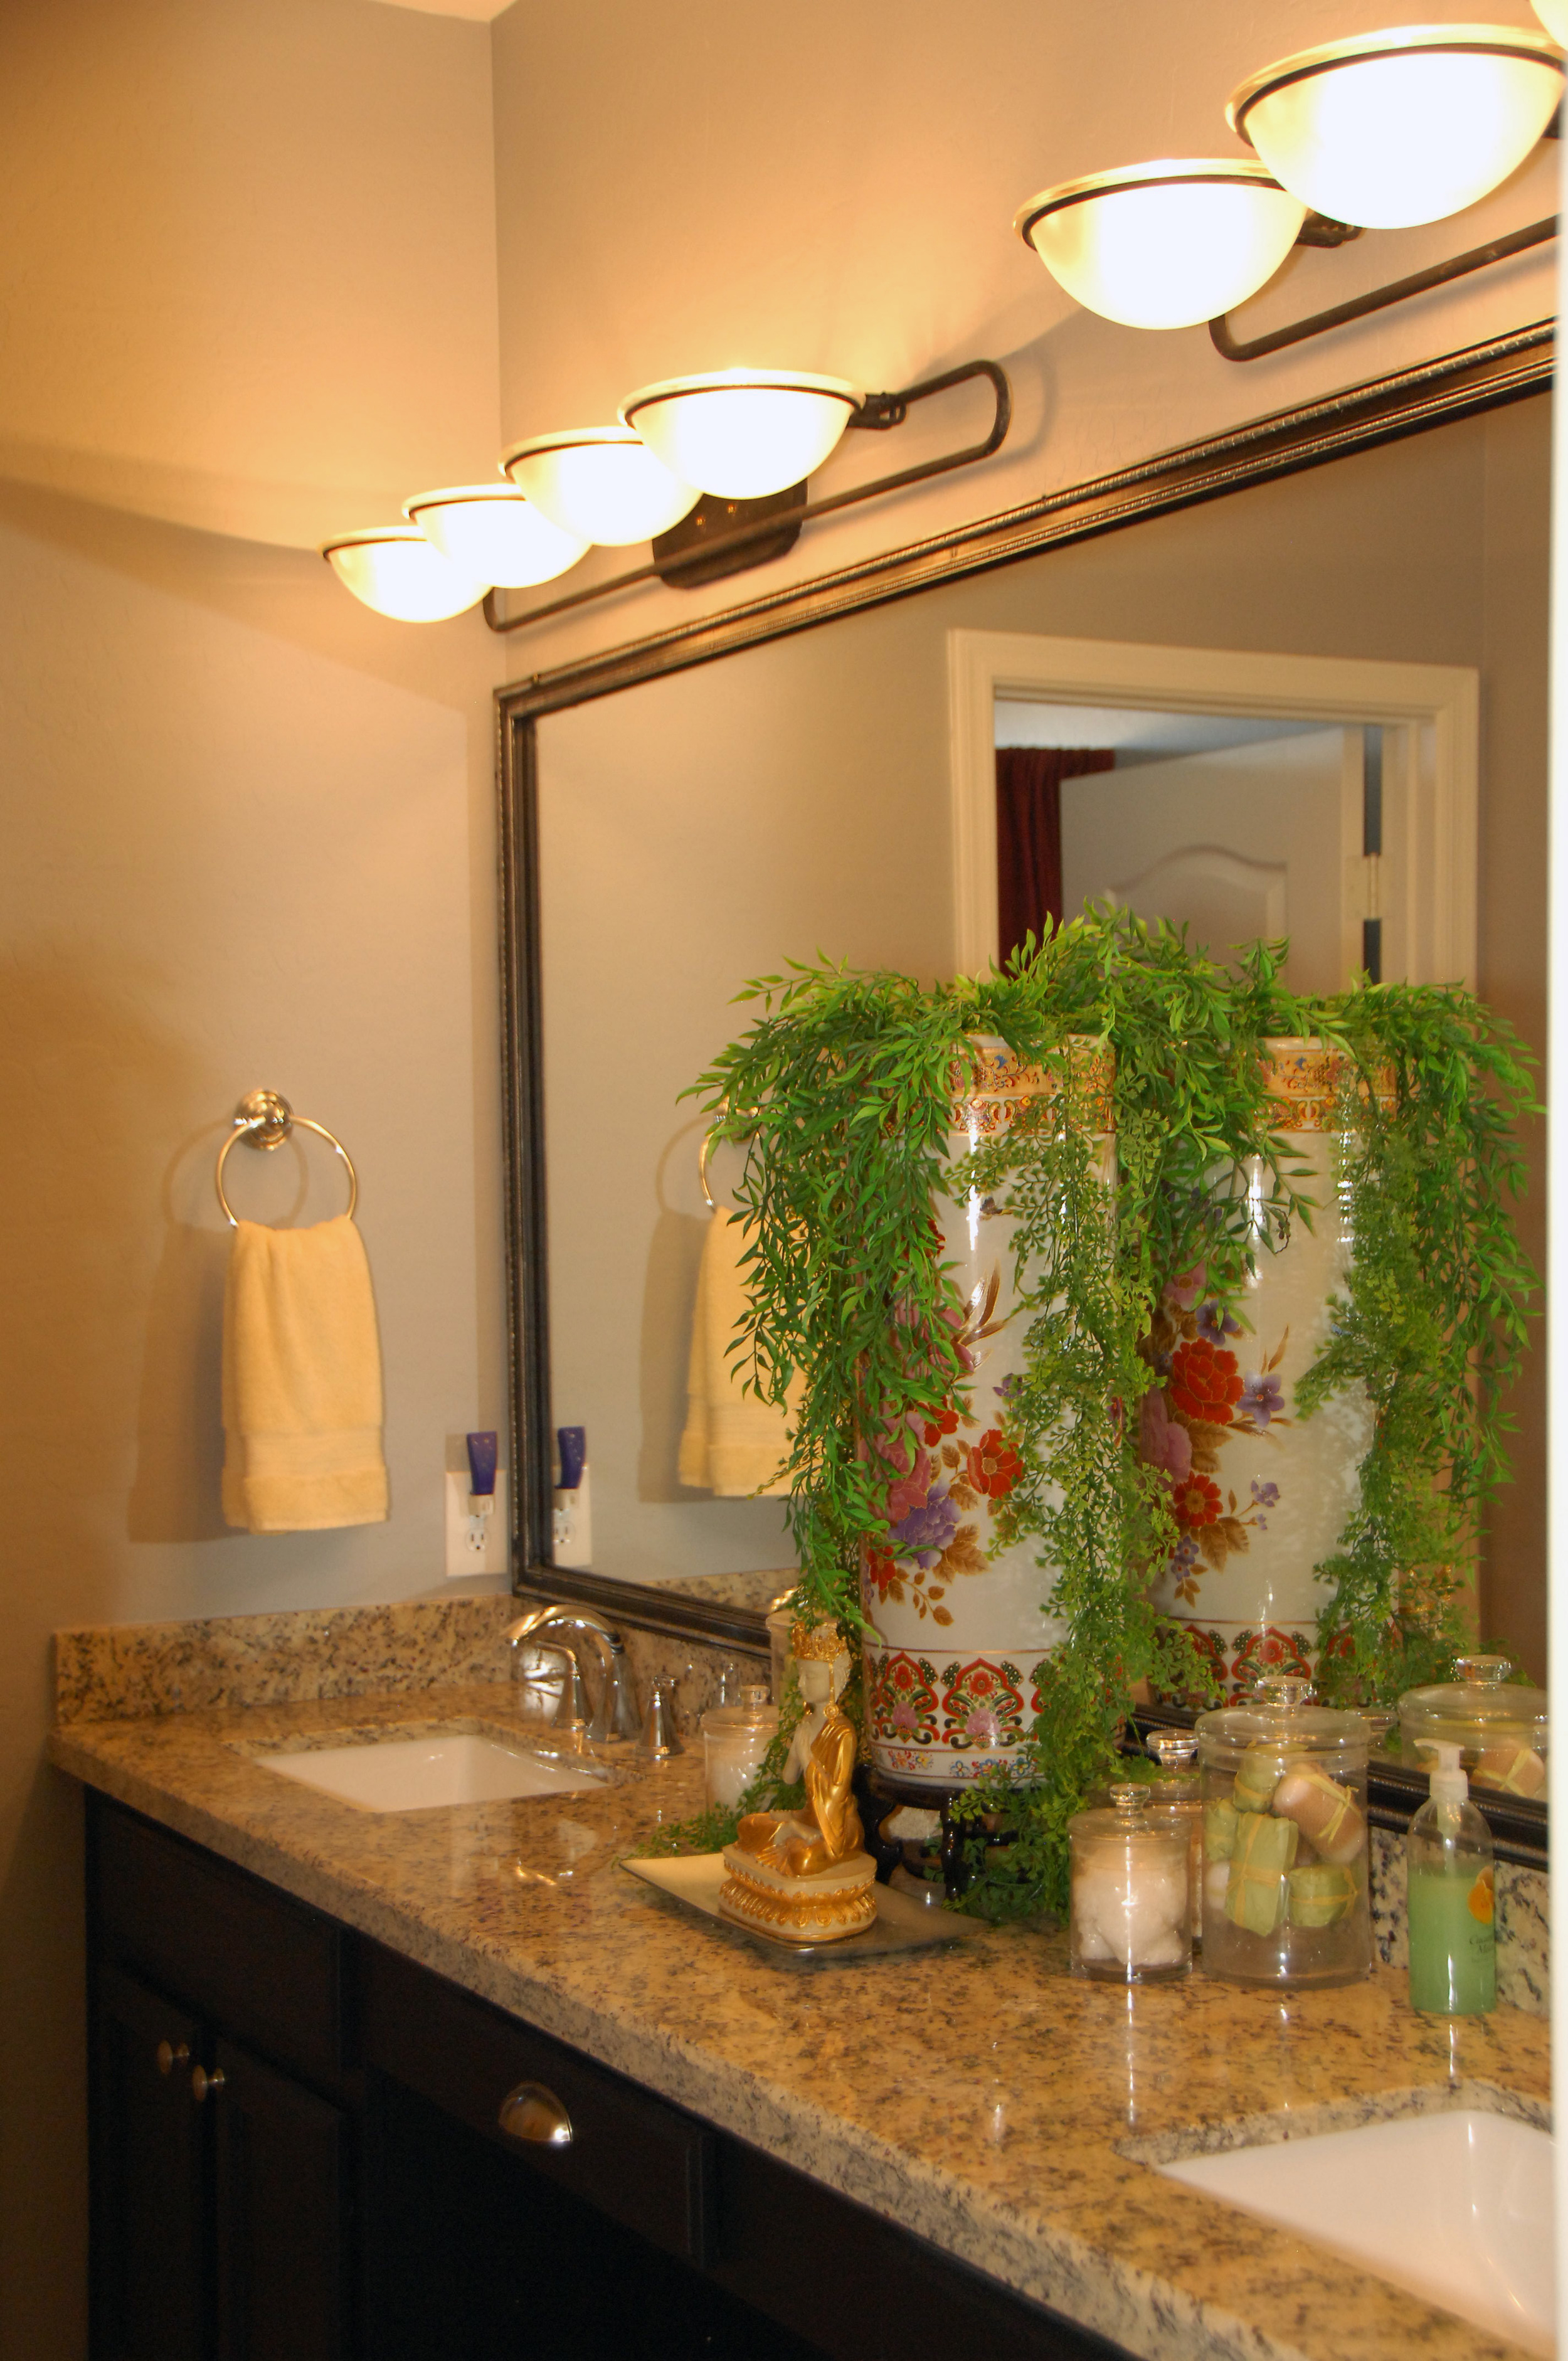 Bathroom number 2 photo 2.JPG